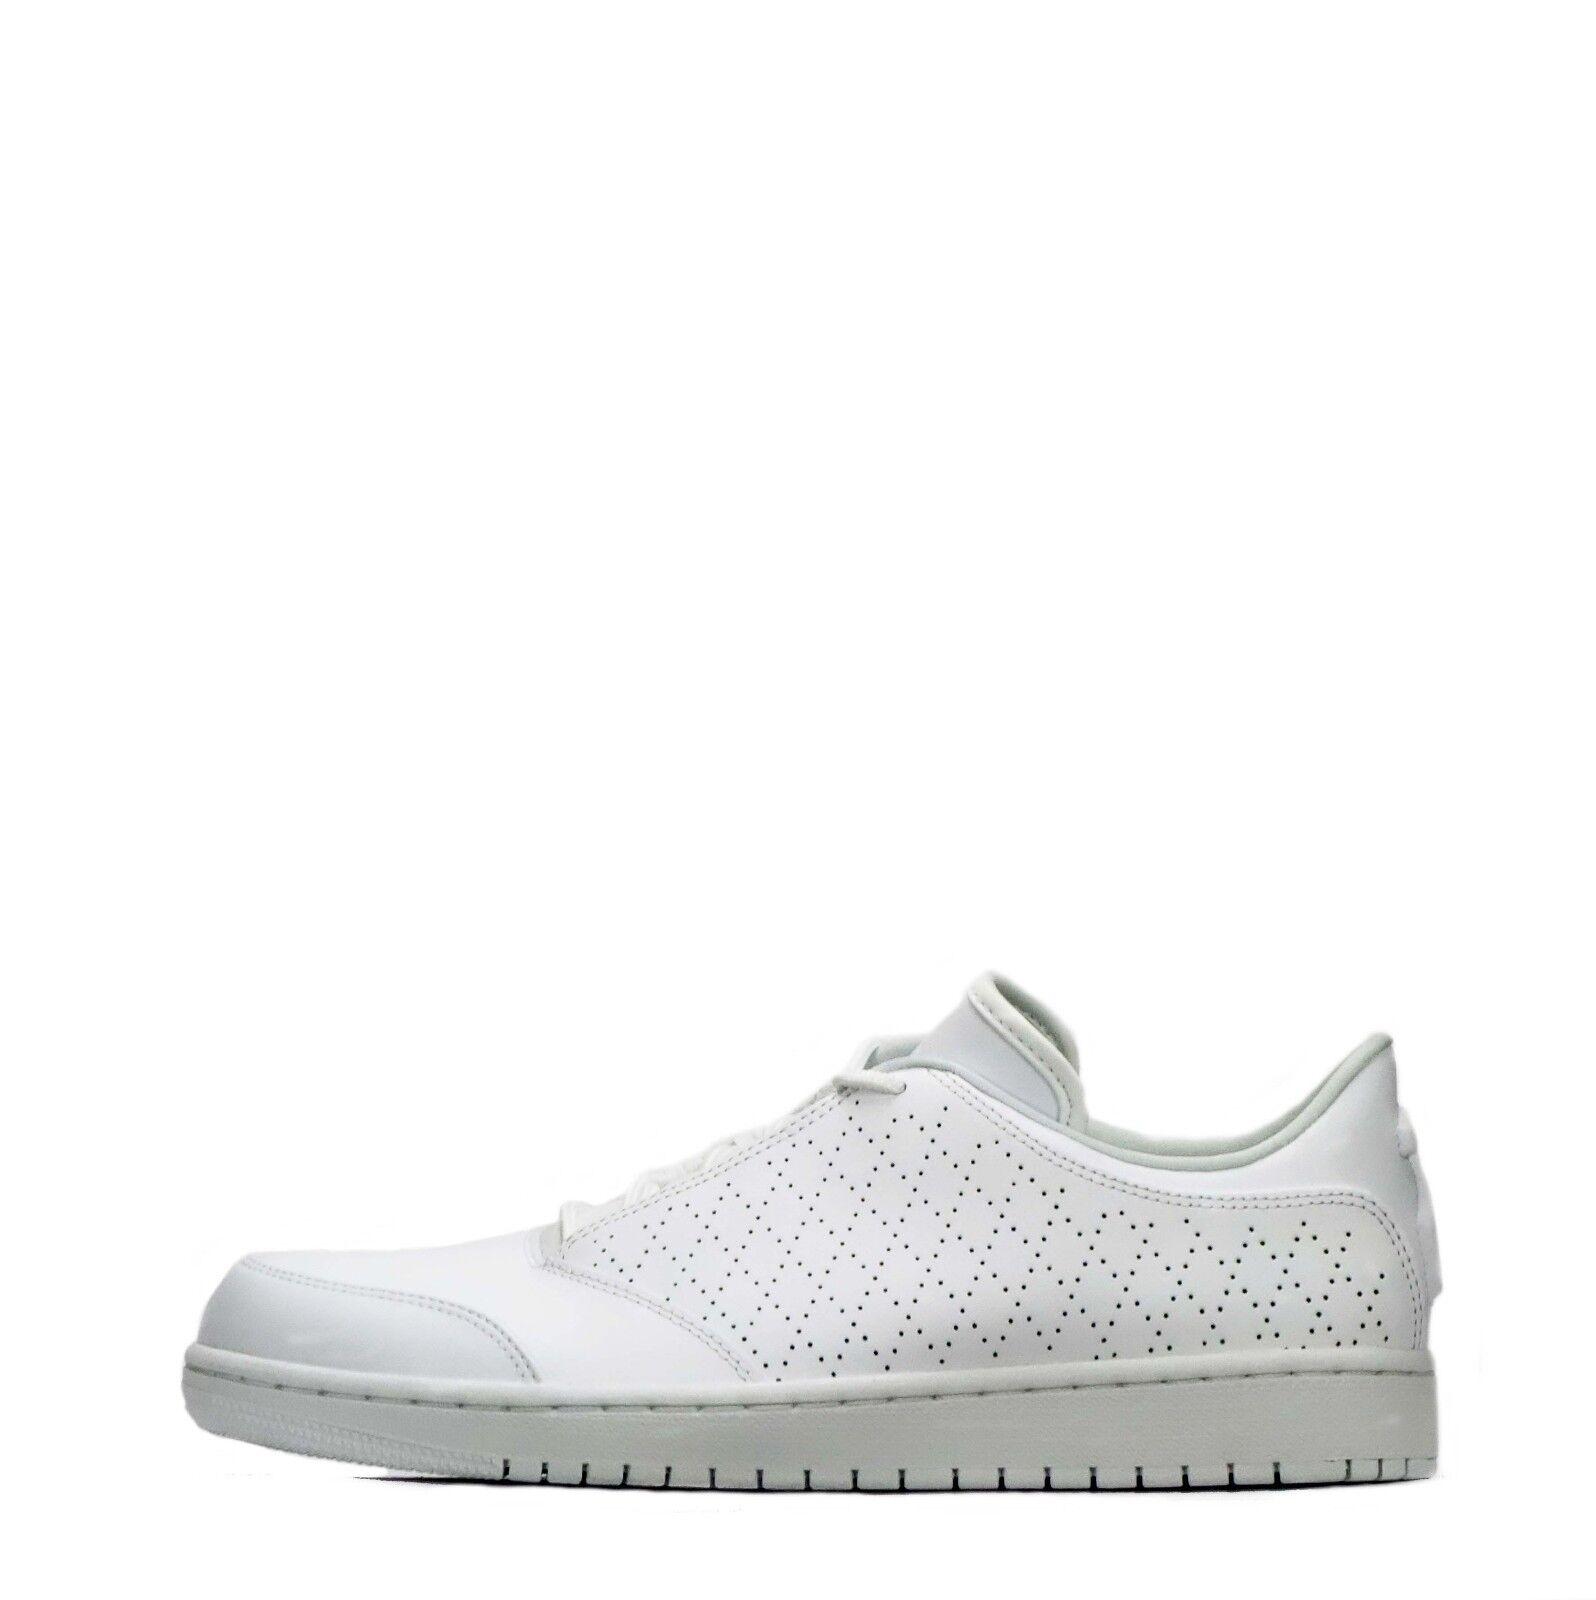 Nike jordan 1 volo 5 bassa / scarpe da uomo bianco / bassa bianco 348bb9